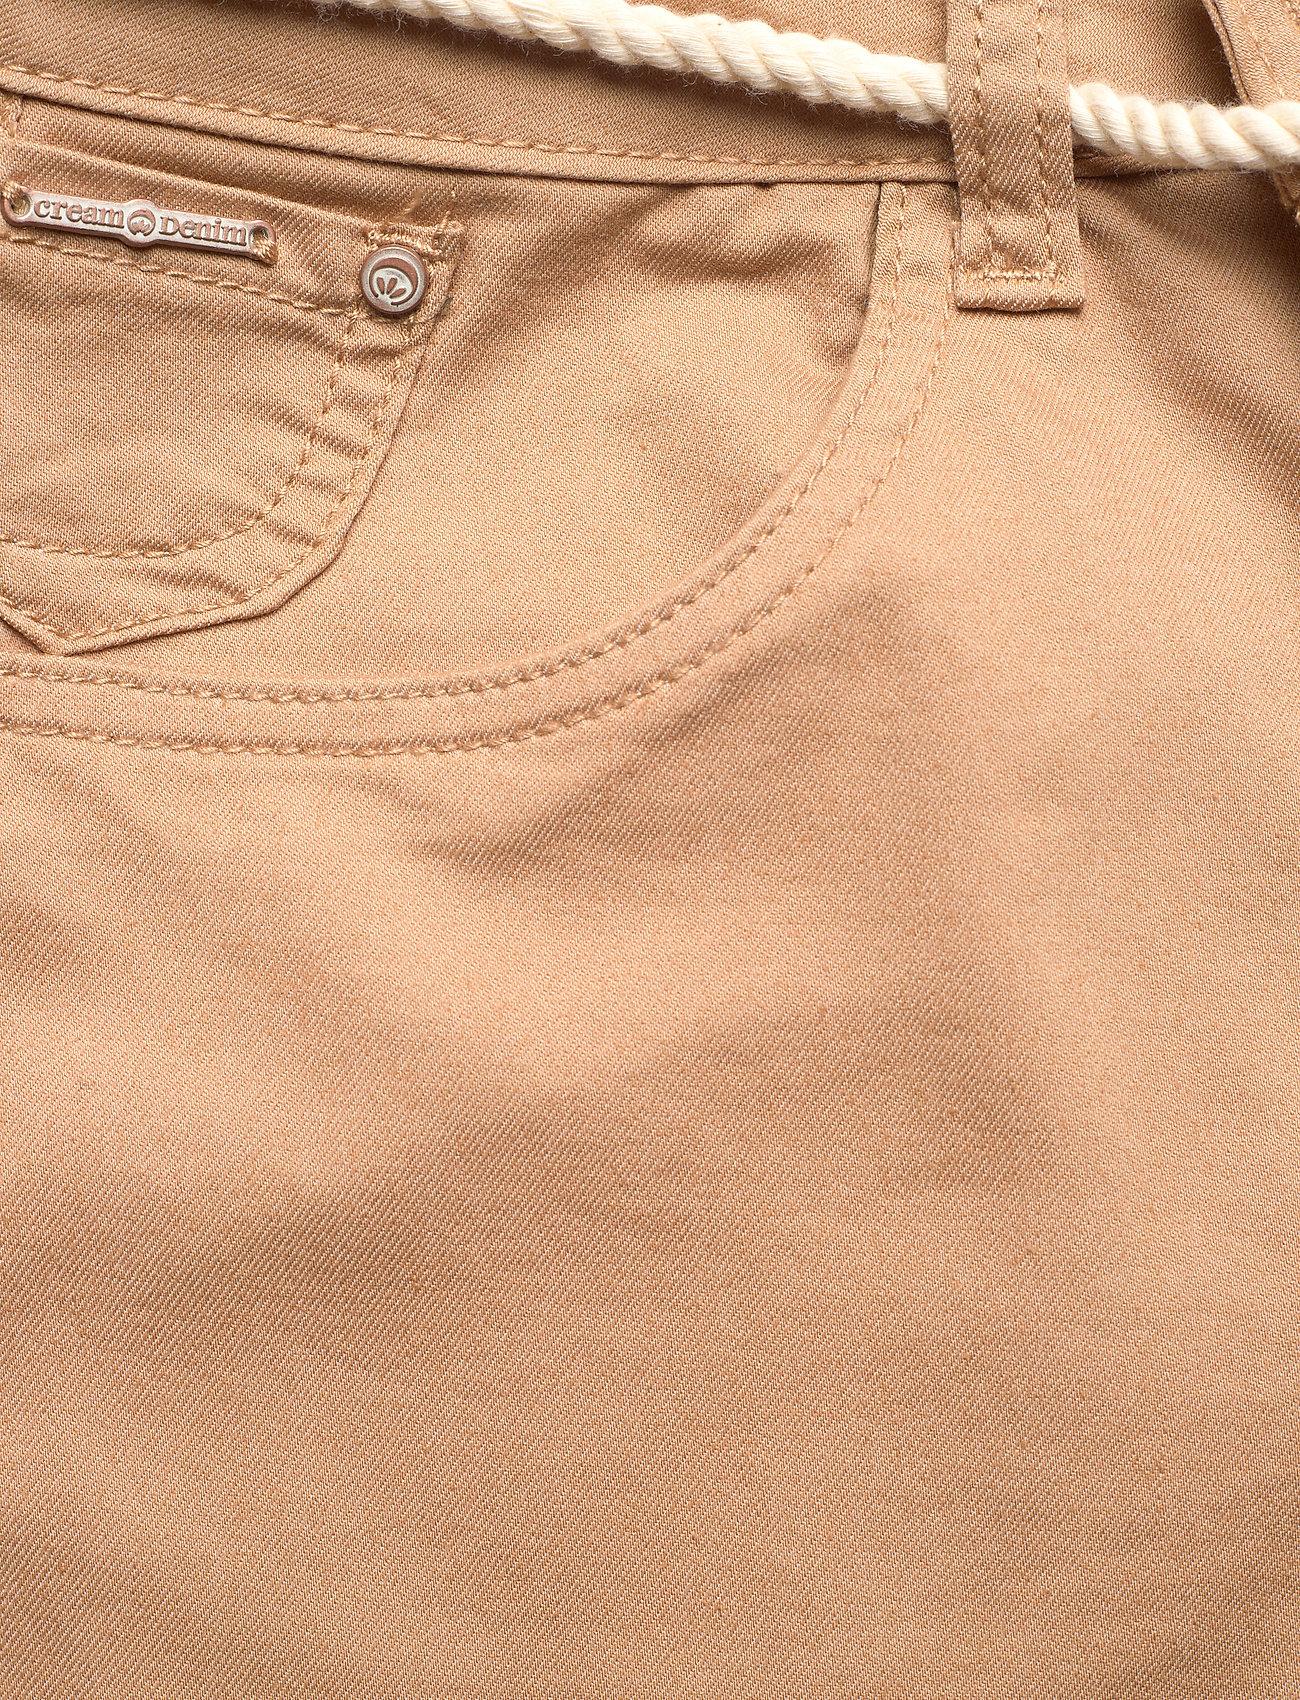 Cream - CRVava Pant 3/4 - Coco Fit - straight regular - tannin - 2